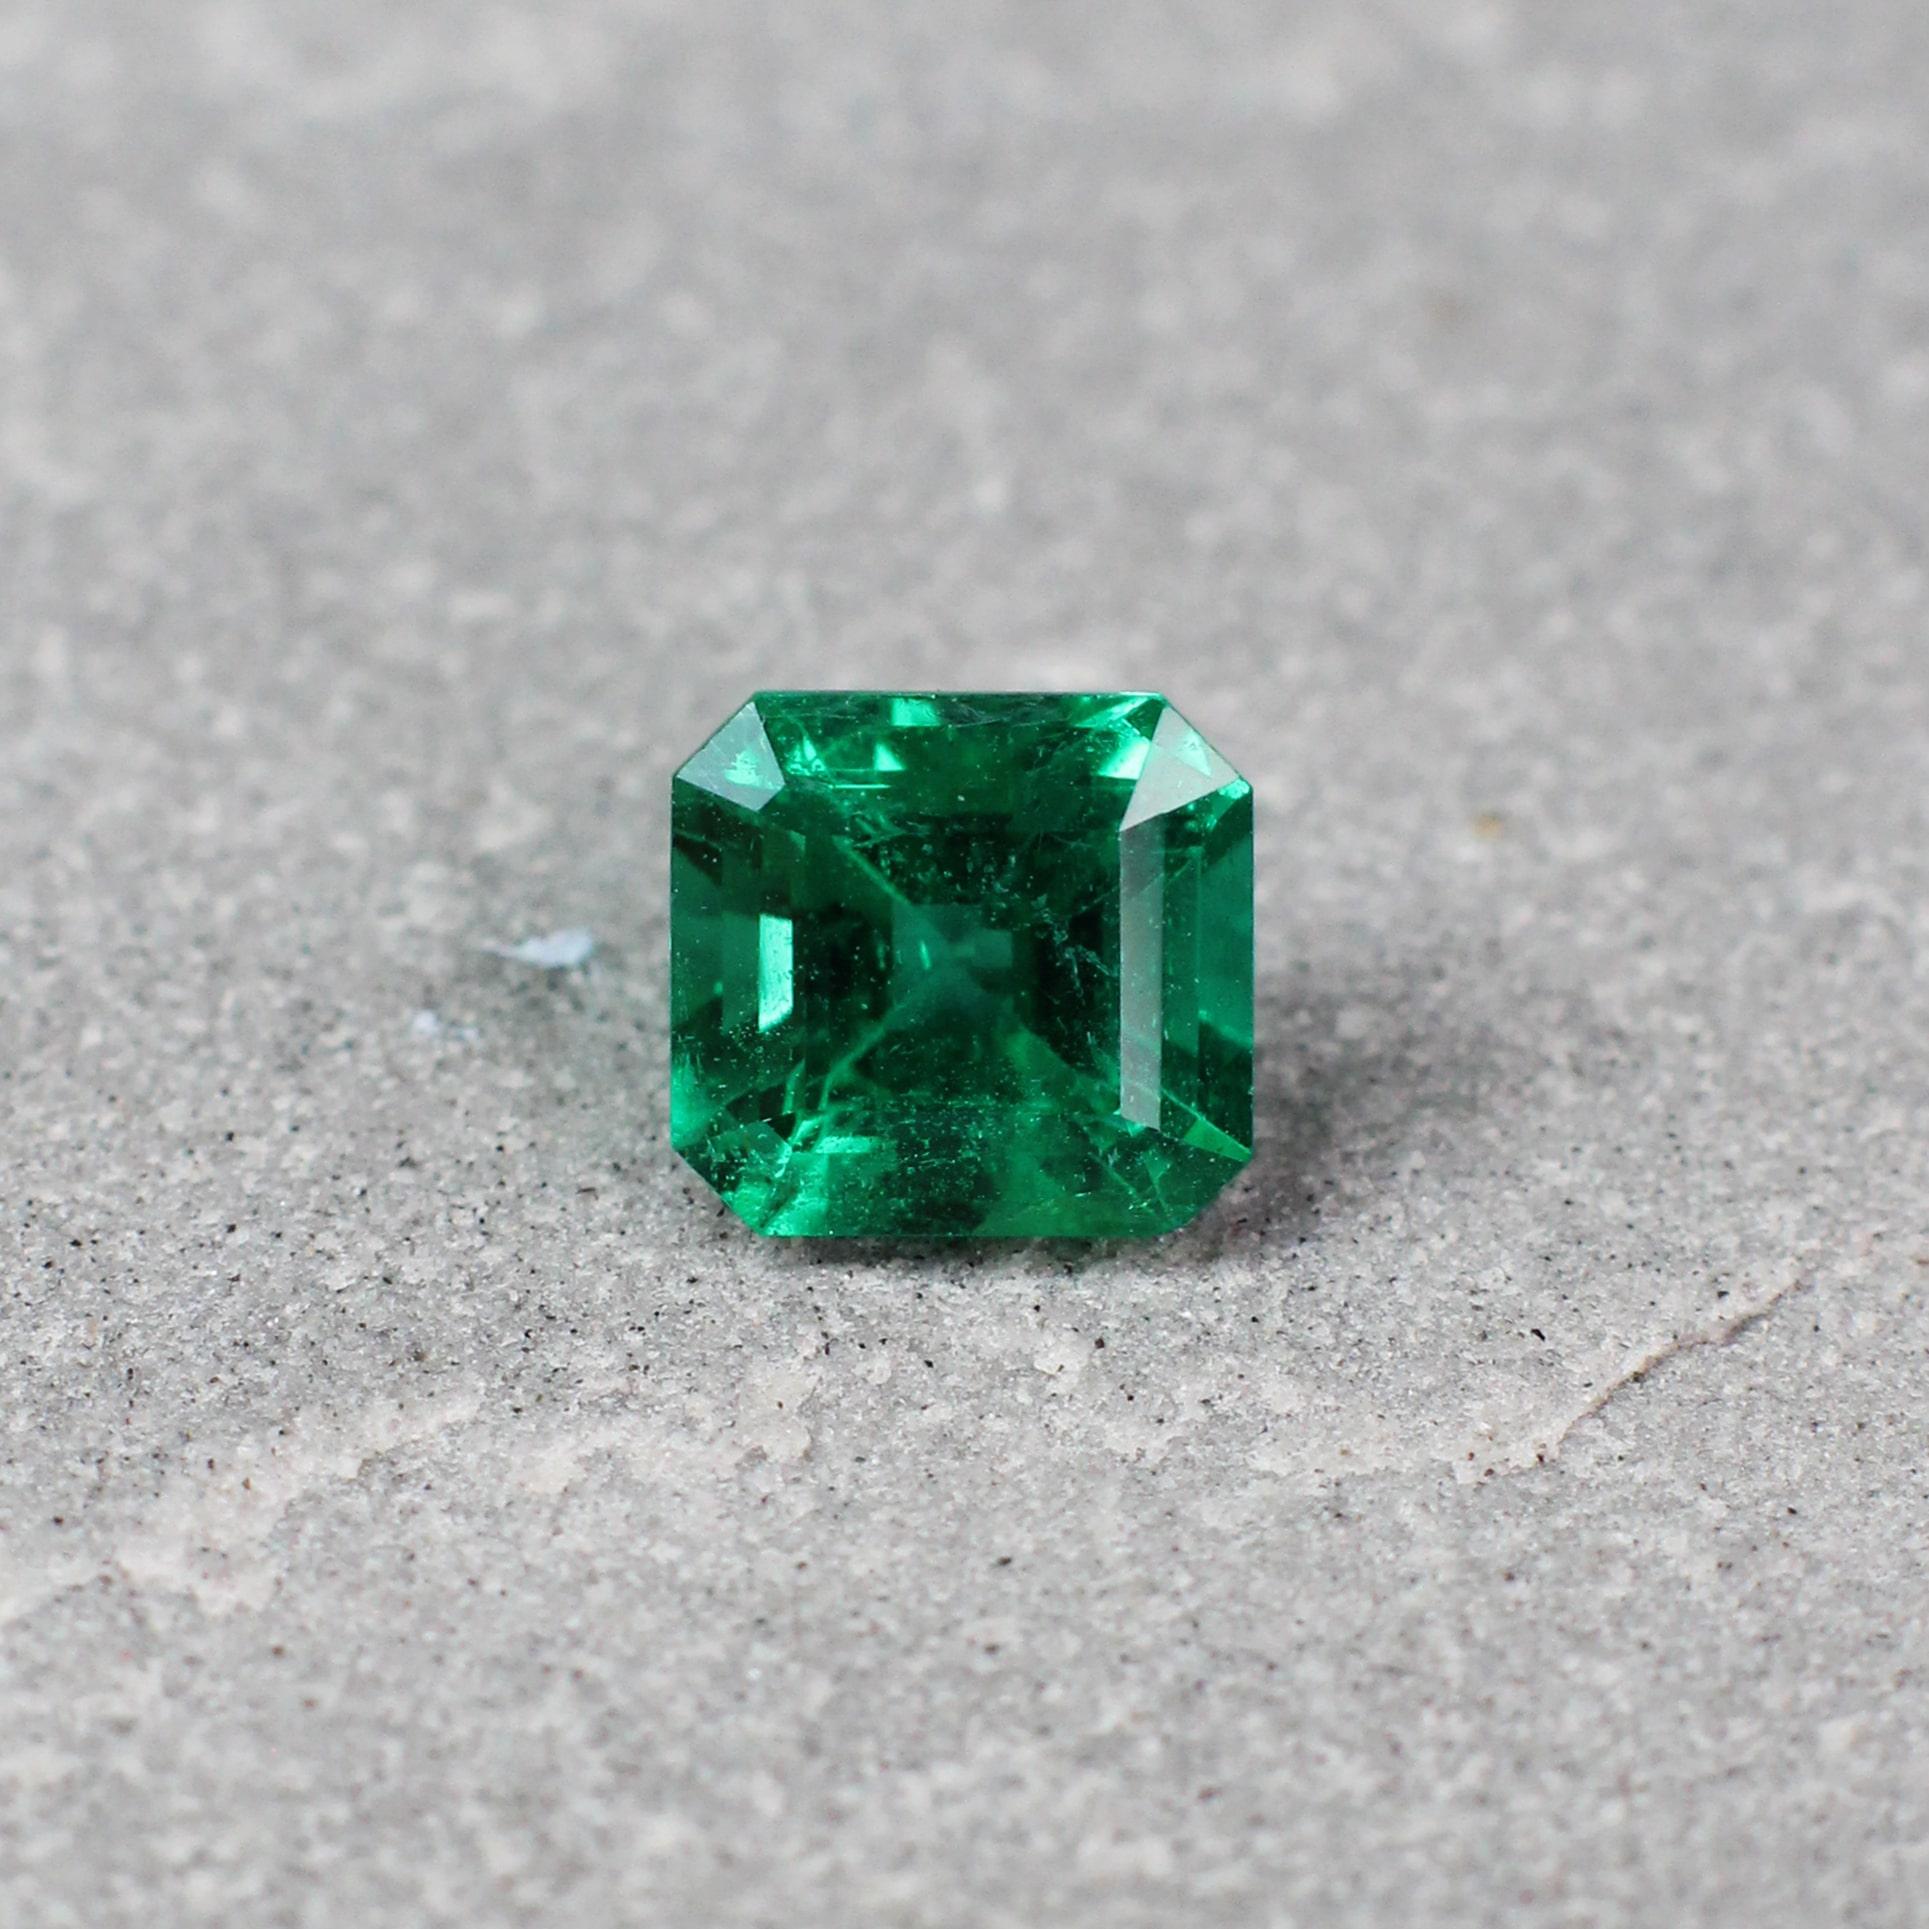 0.95 ct emerald cut green emerald